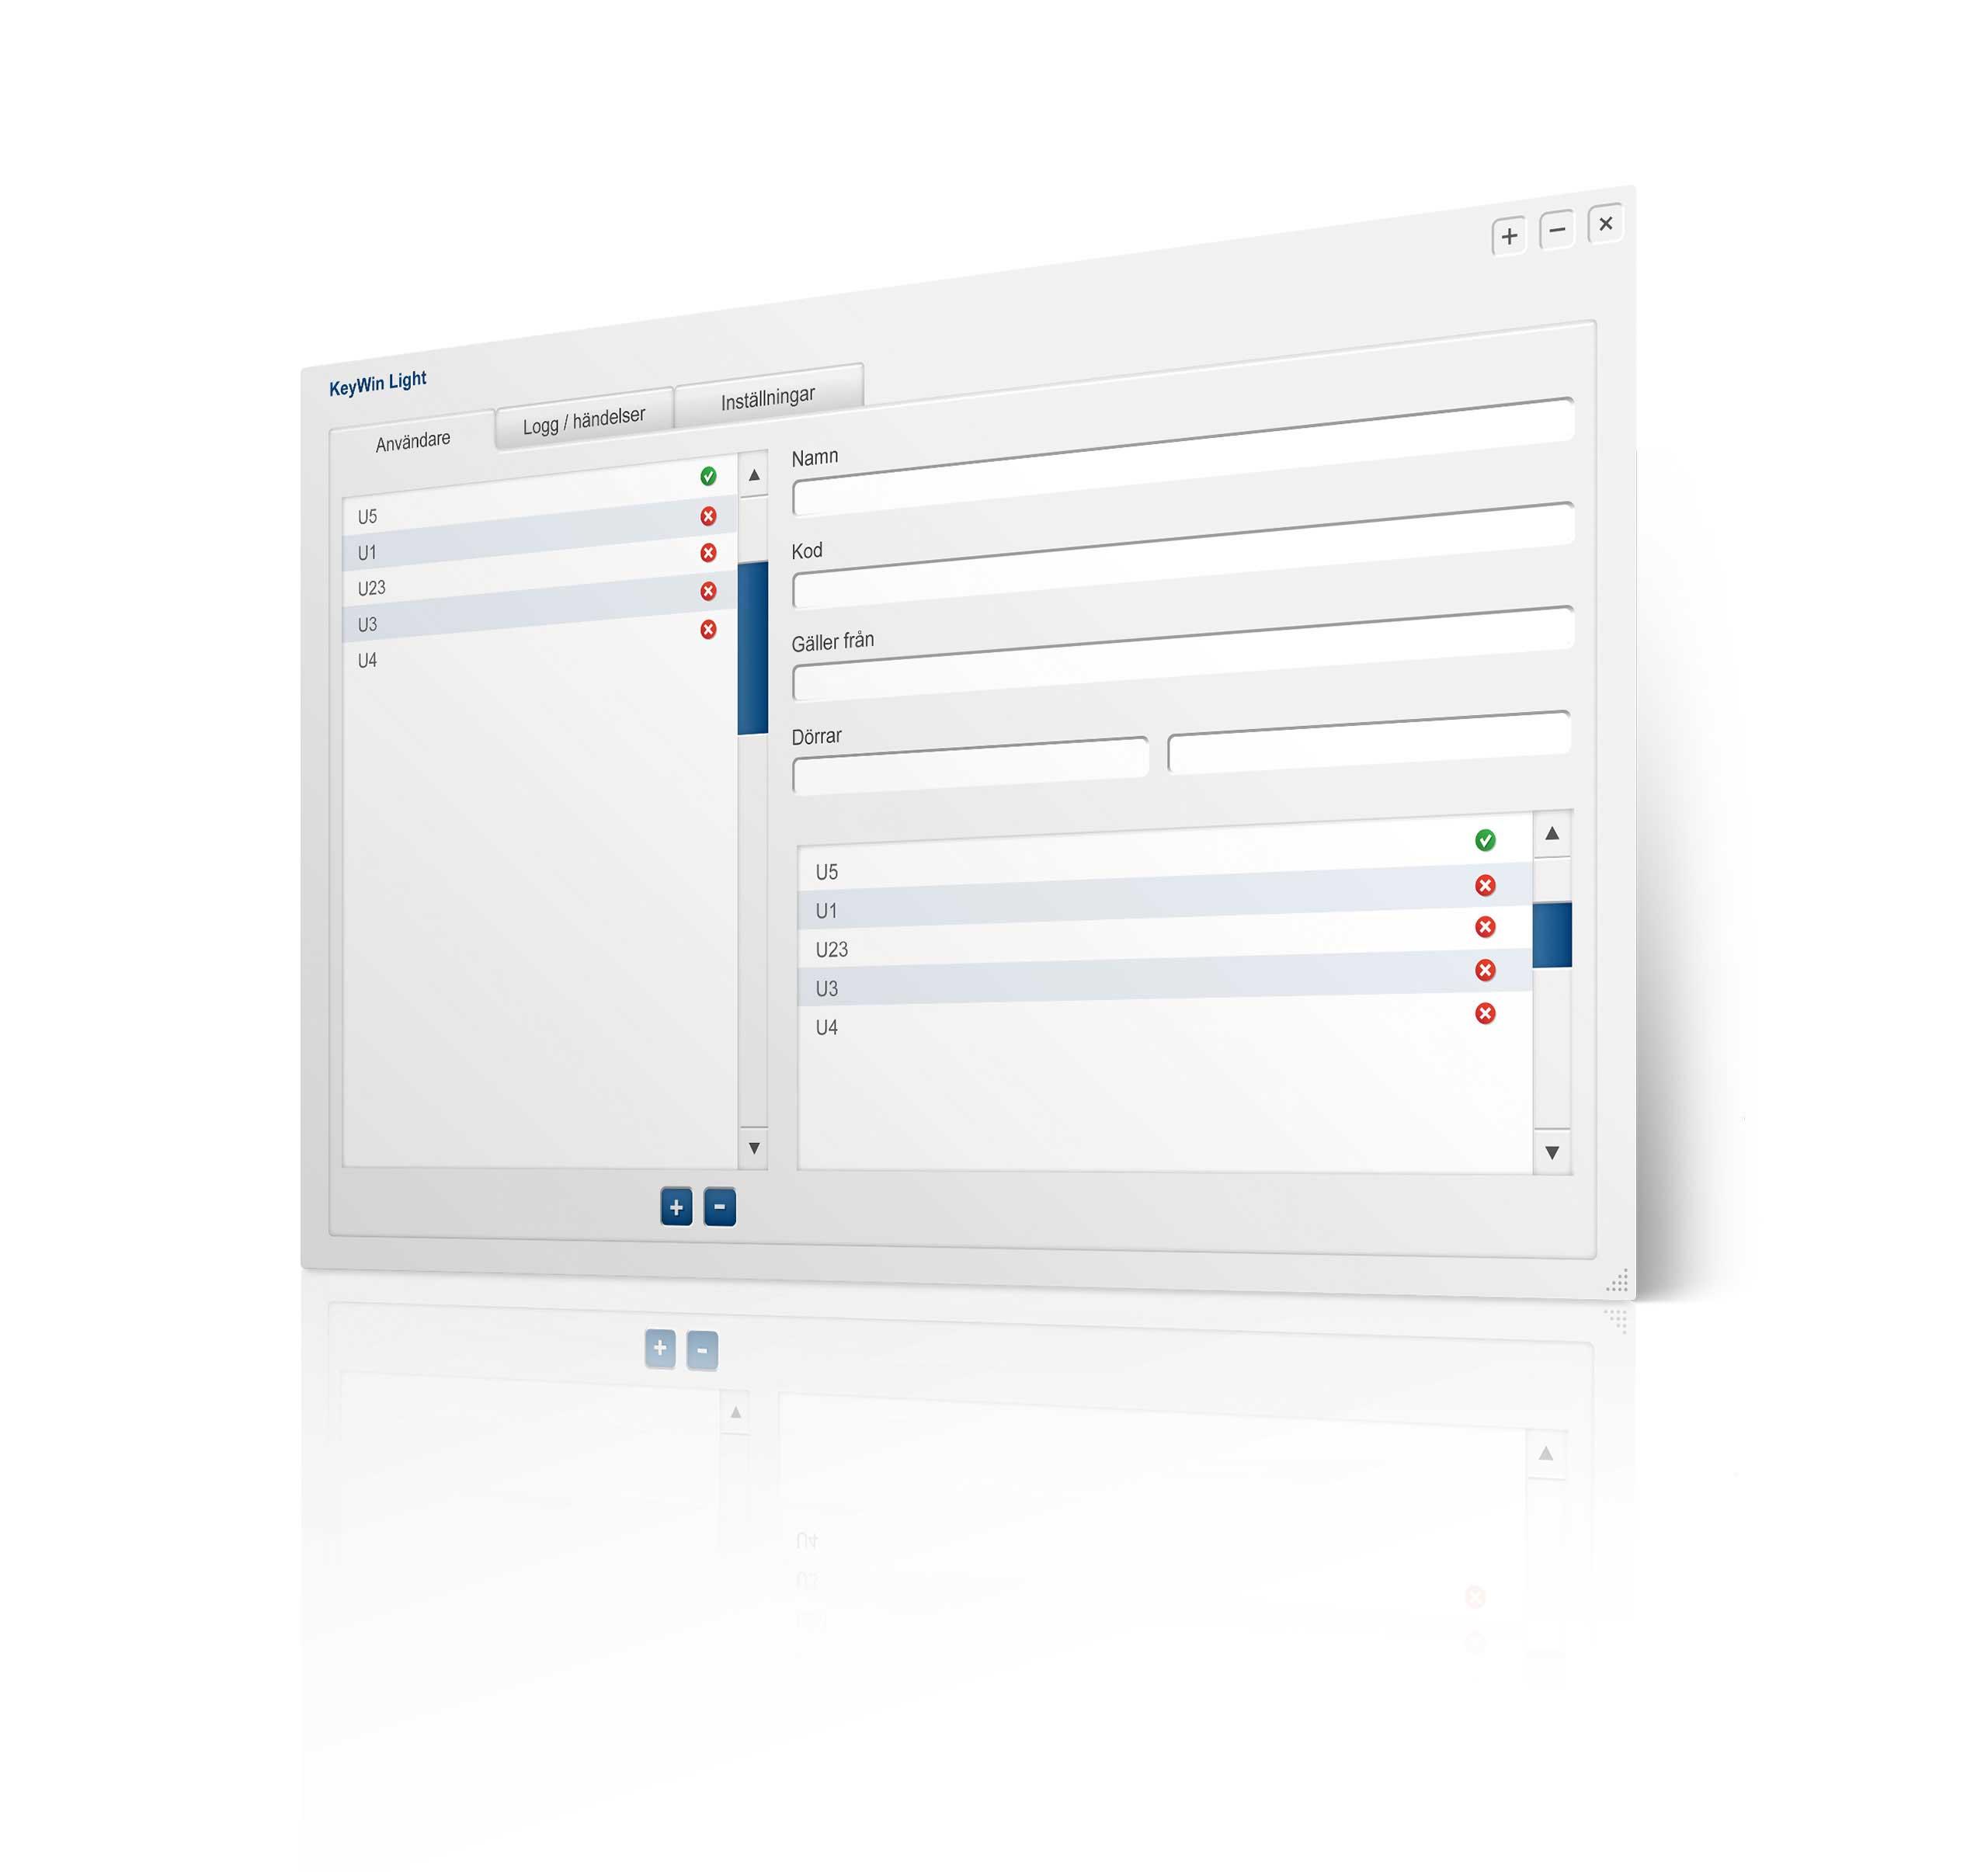 Programmaweergave van het sleutelmanagementprogramma KeyWin Light